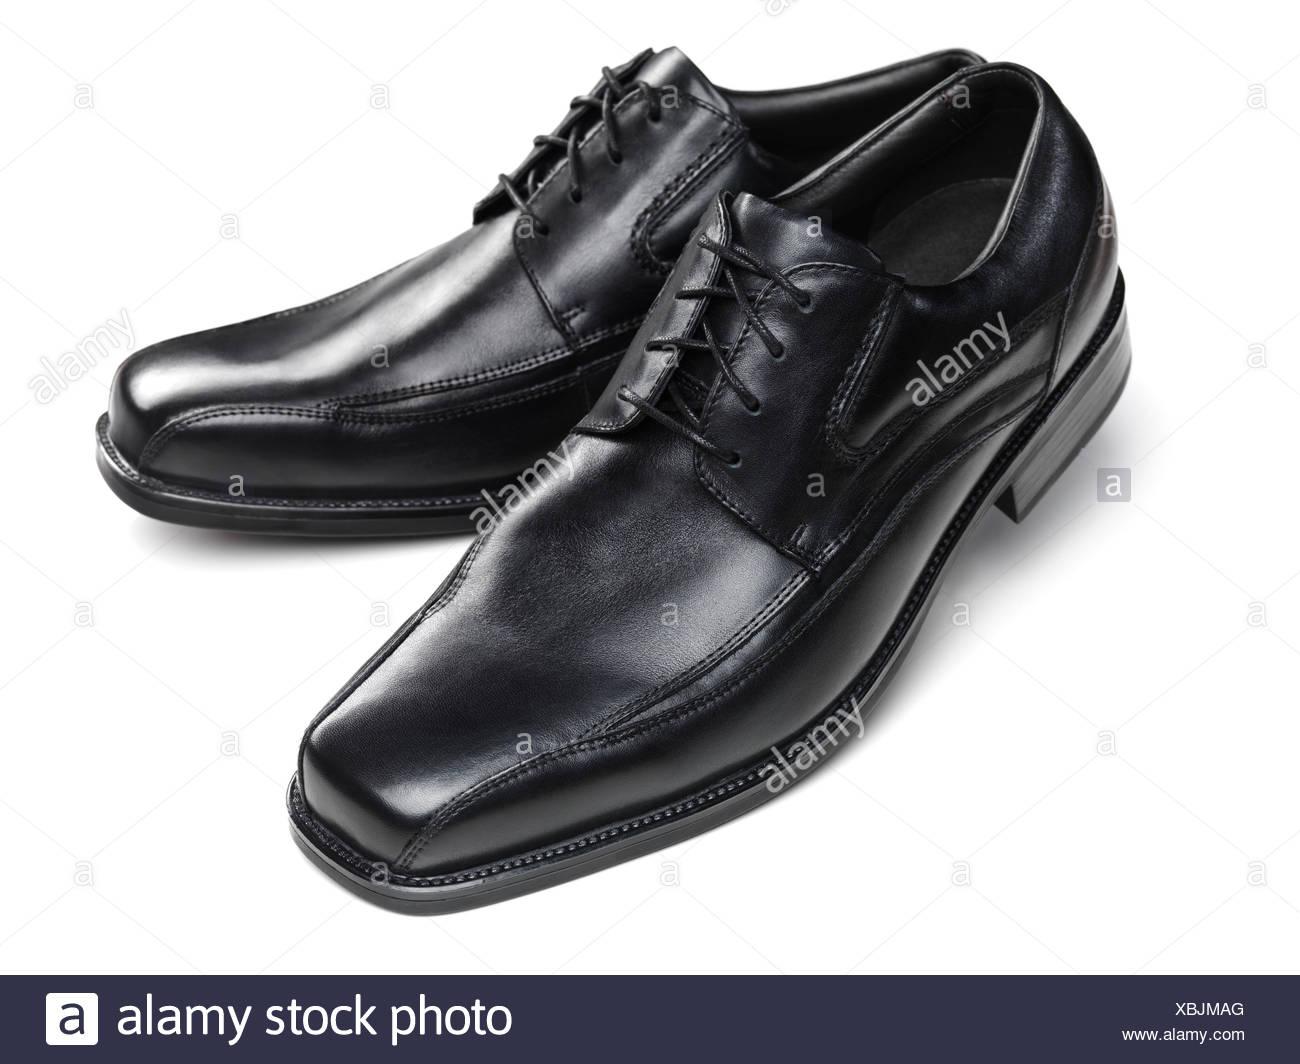 9c8313f0 Pair of black men's dress shoes Stock Photo: 282538216 - Alamy